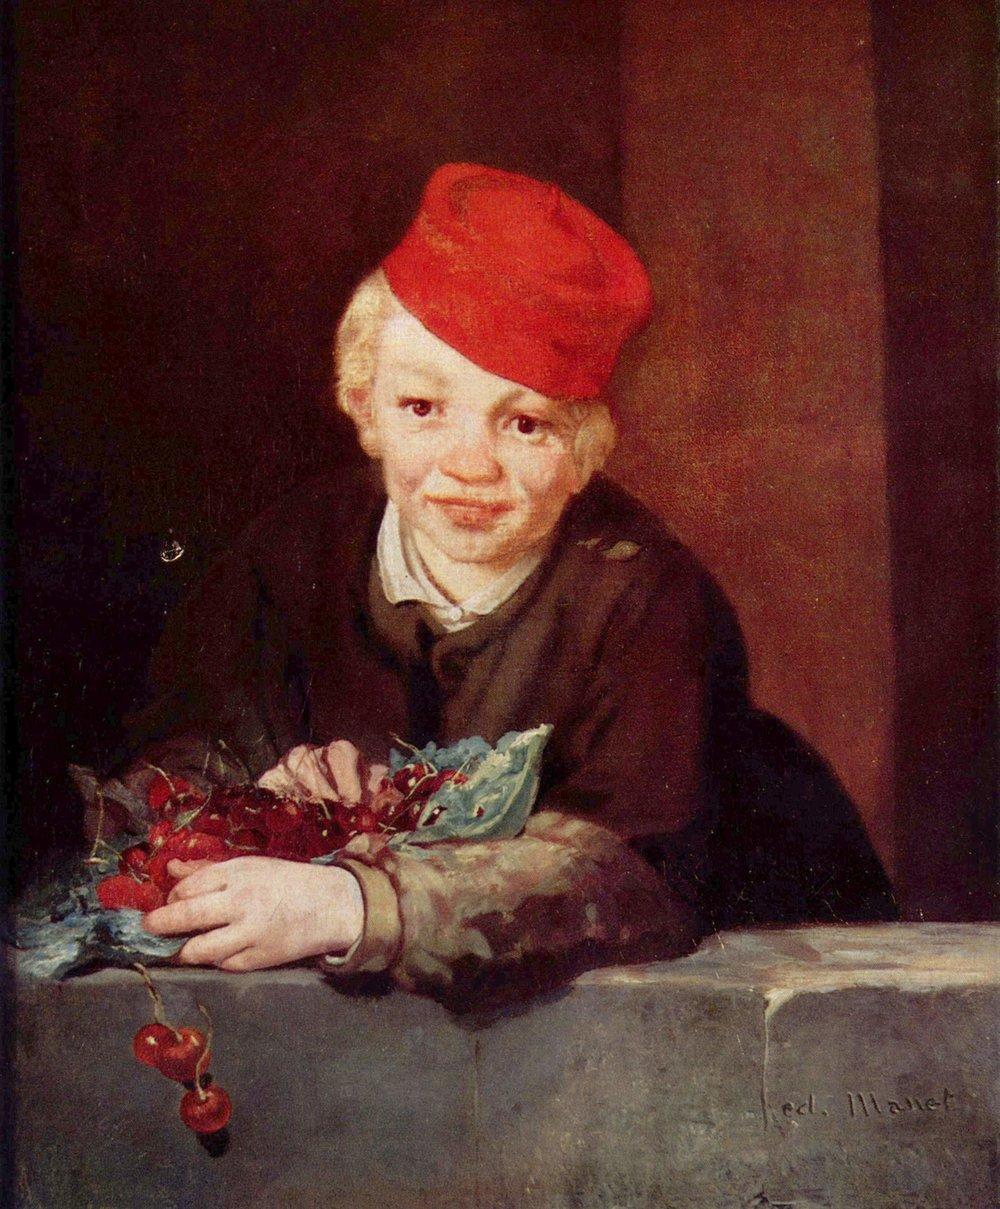 Edouard Manet - Boy with Cherries, 1859.